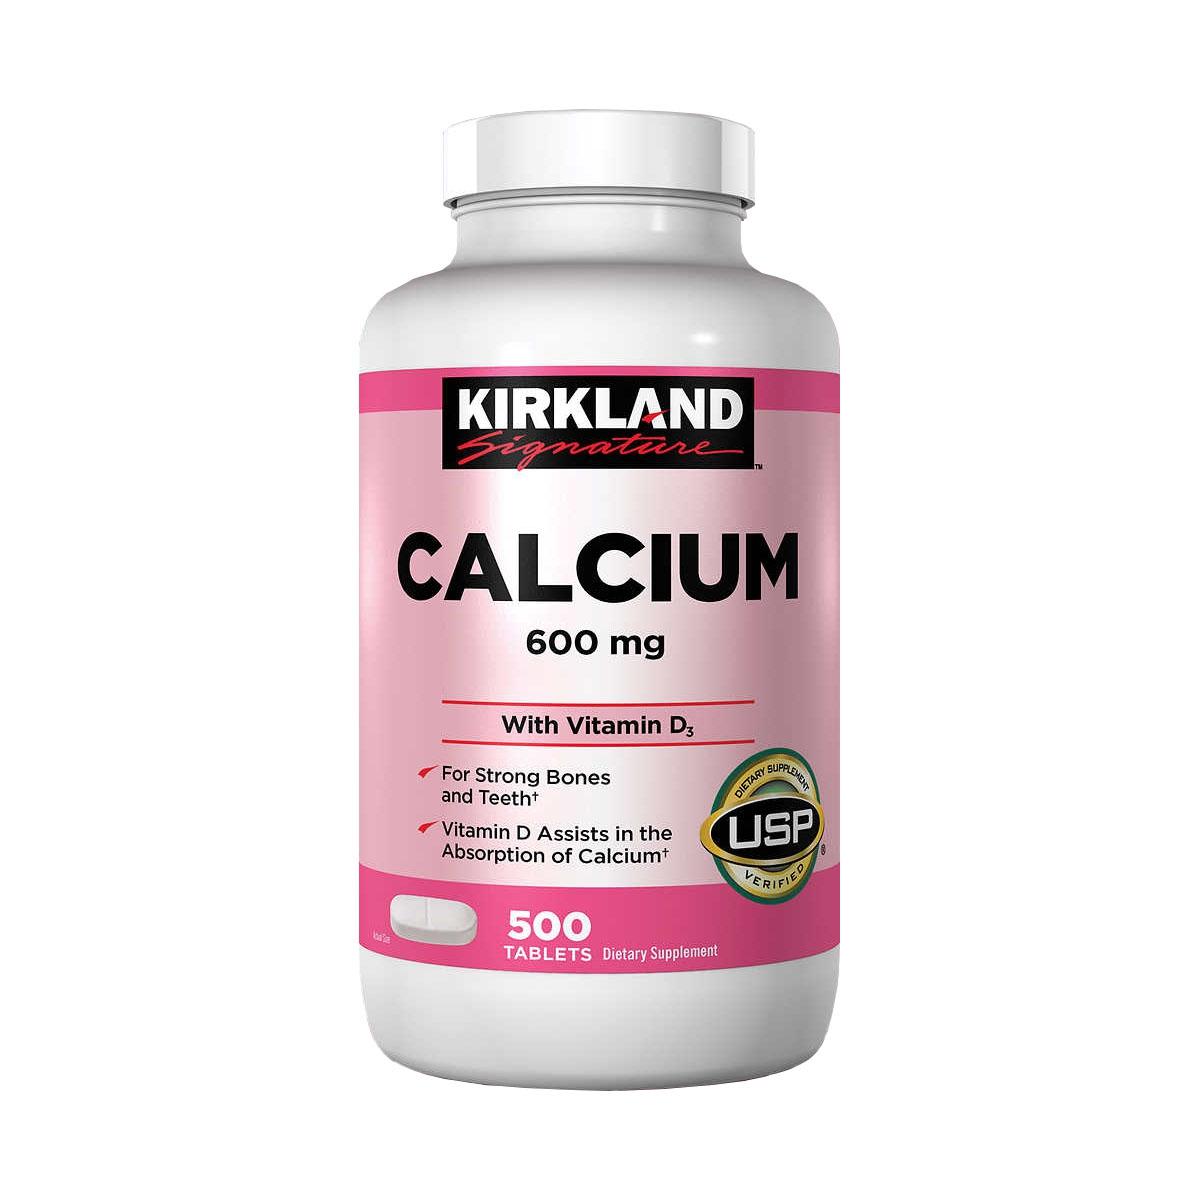 Kirkland Calcium 600mg + Vitamin D3